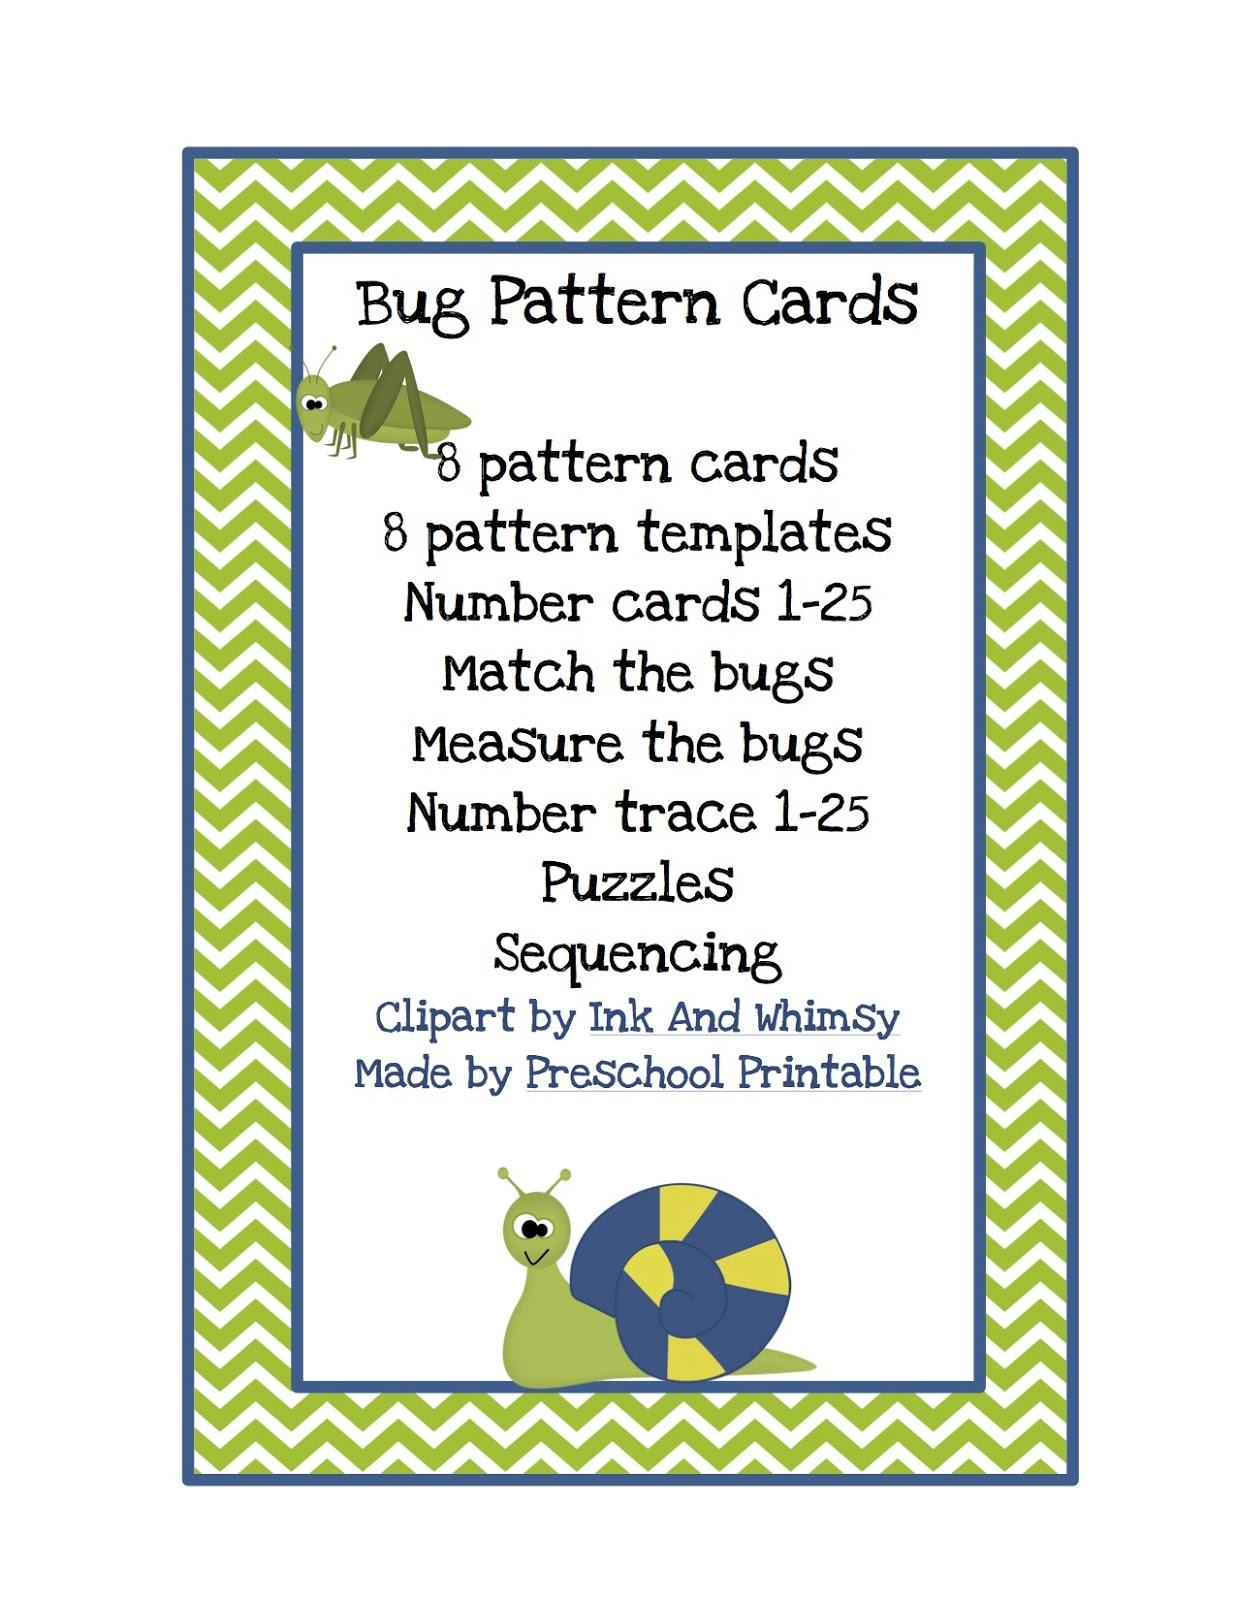 Bug Pattern Cards For Boys Preschool Printables